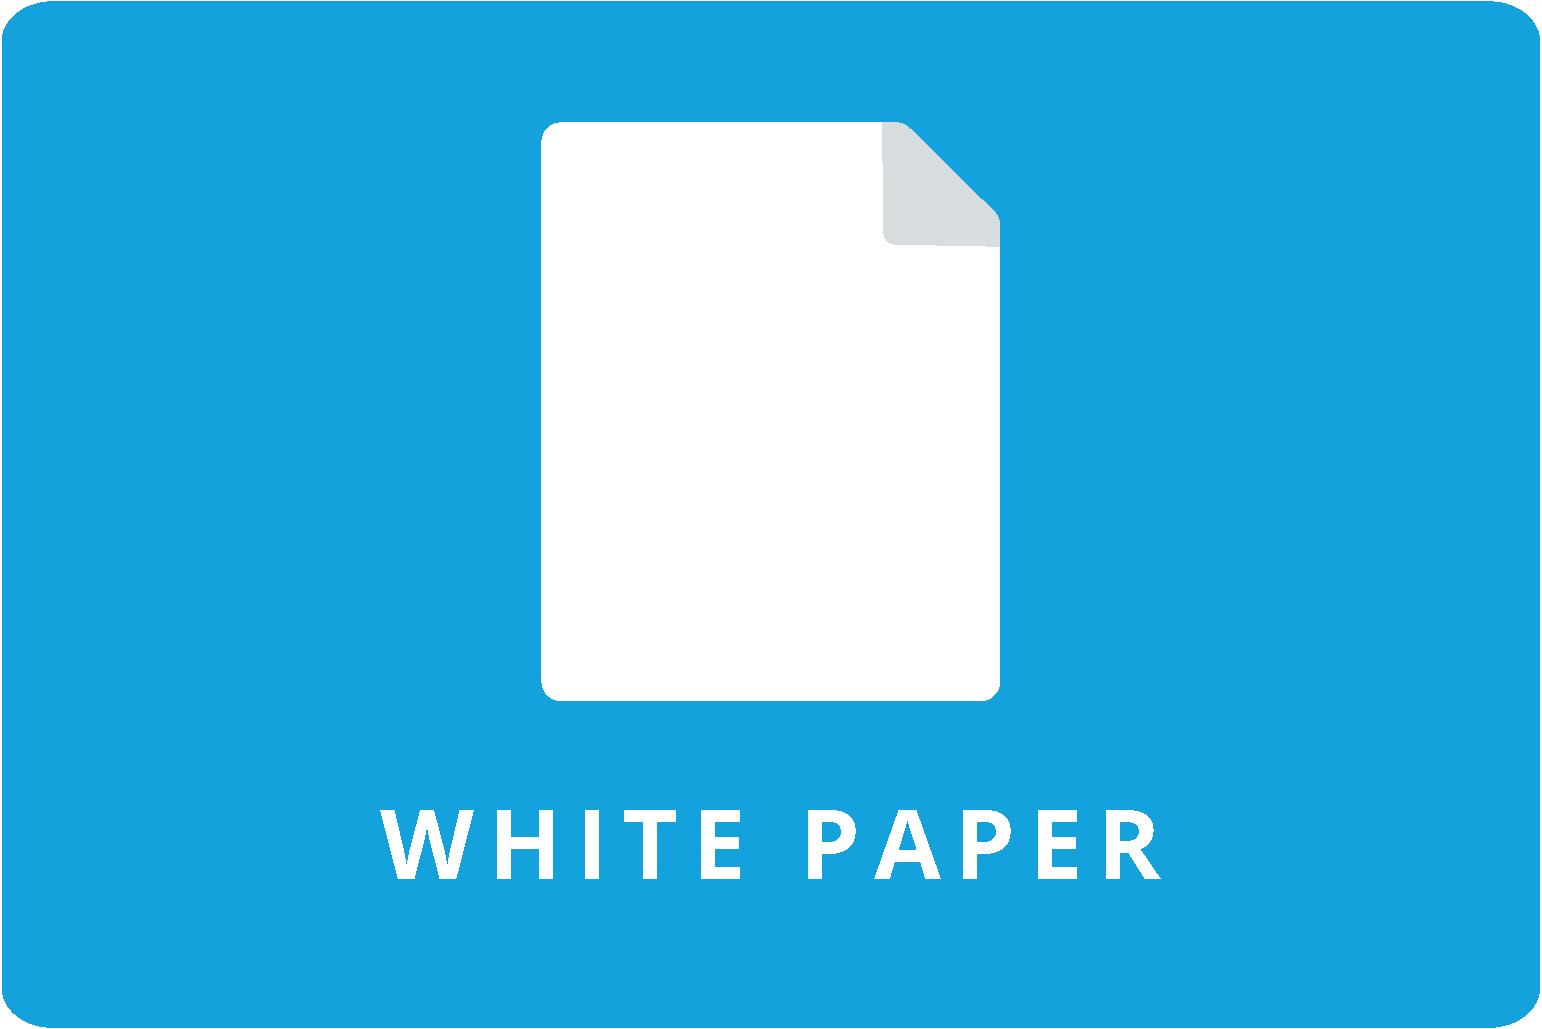 وایت پیپر white paper